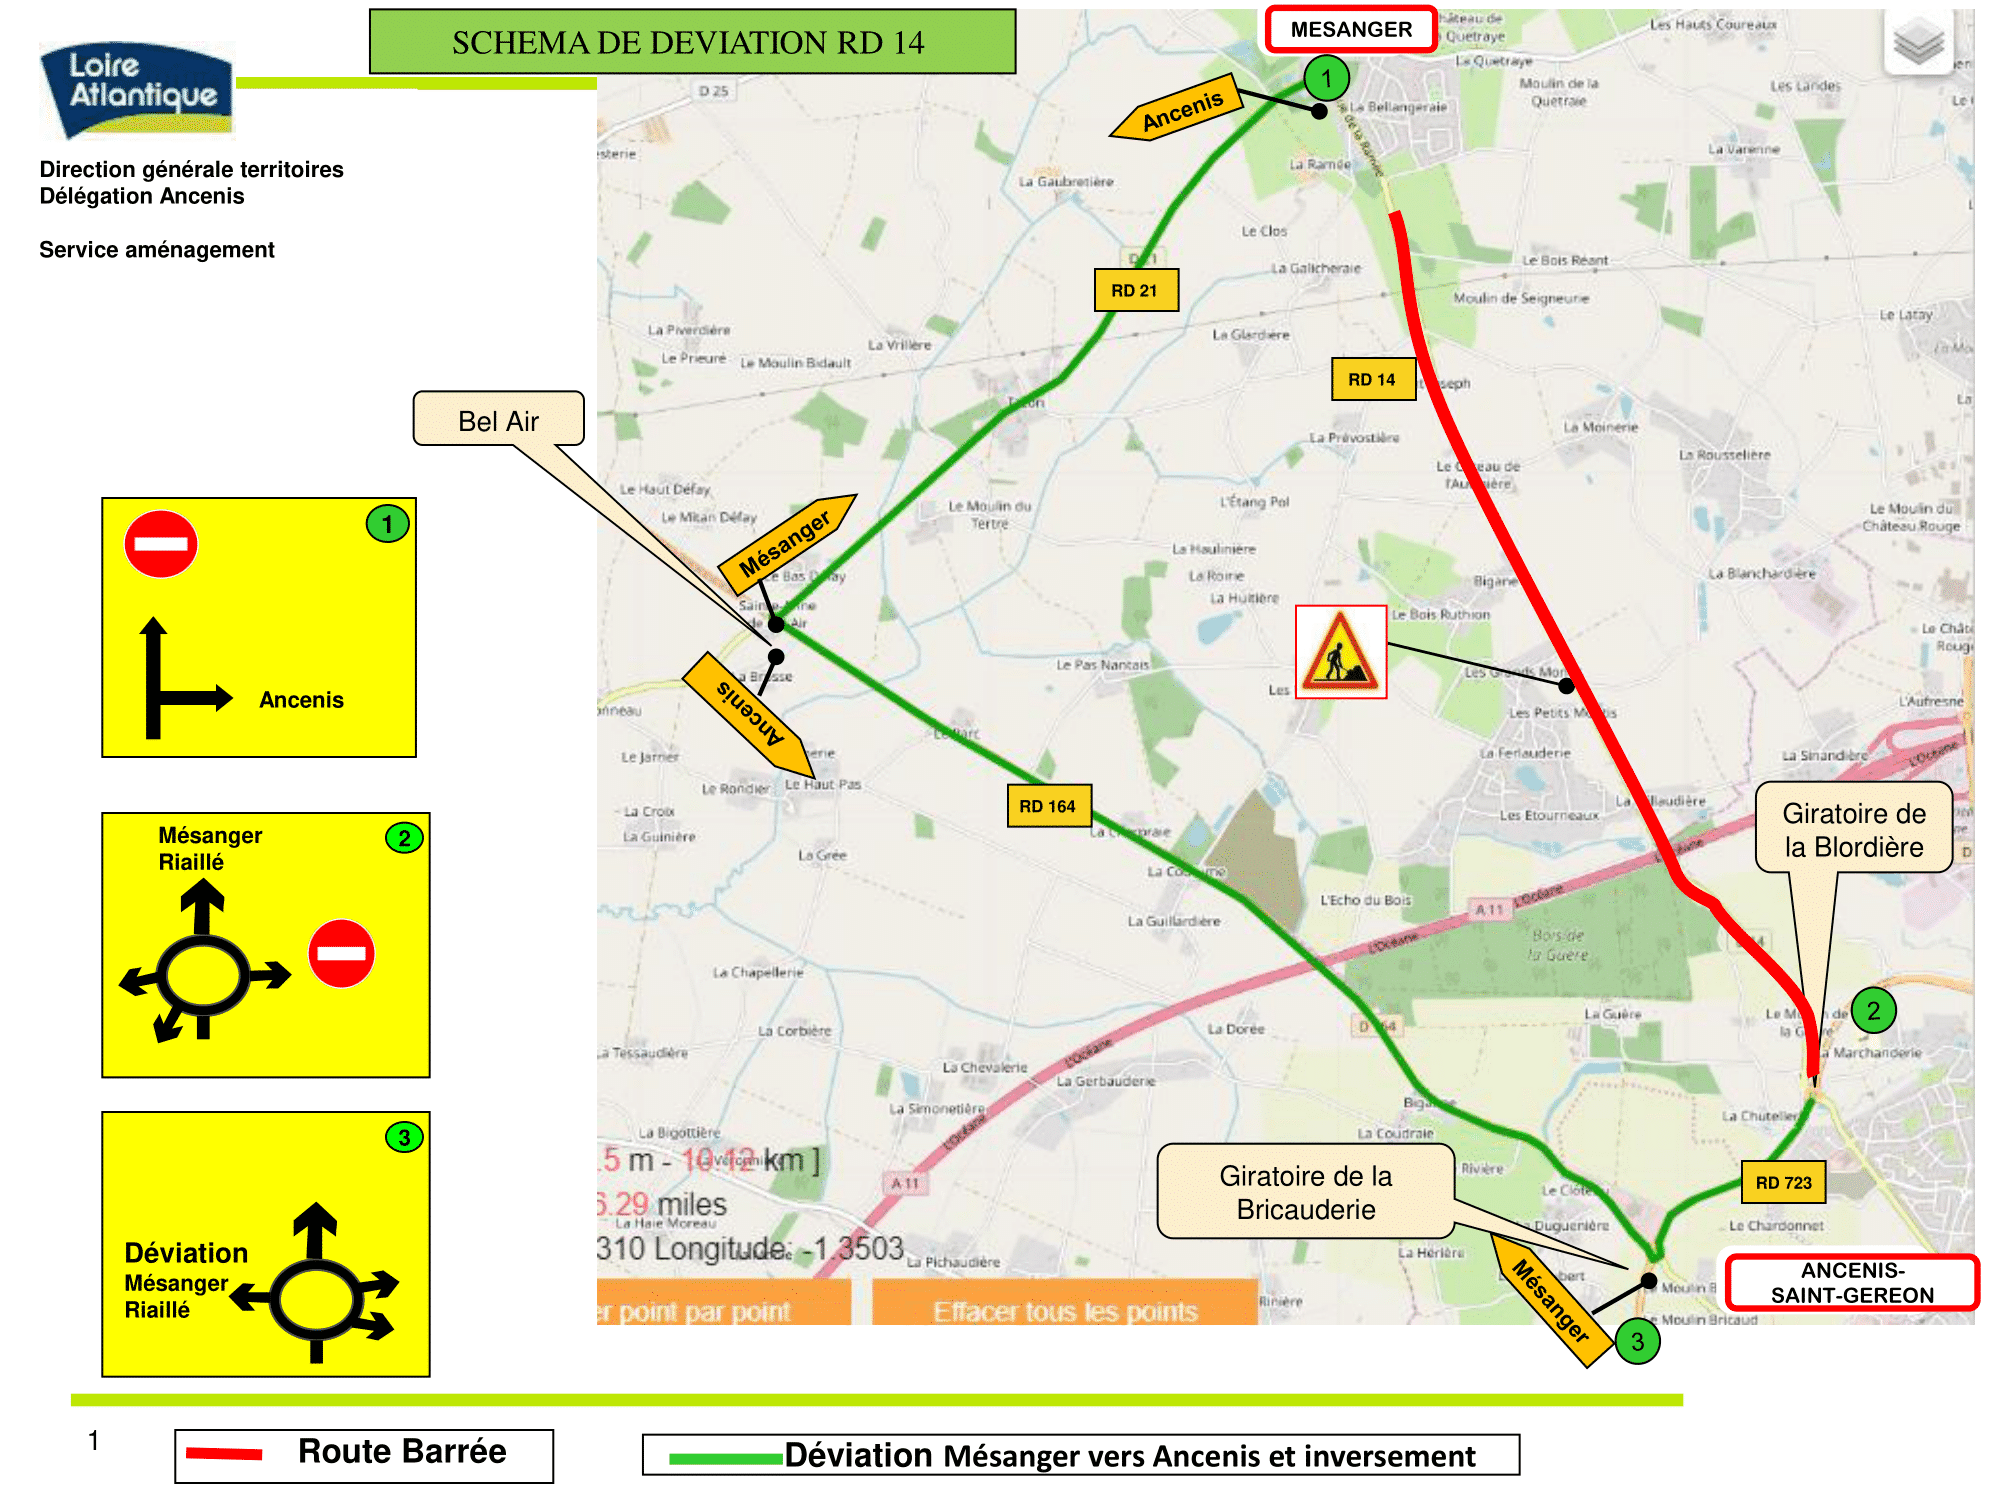 Arrêté circulation – RD14, Mairie de Mésanger